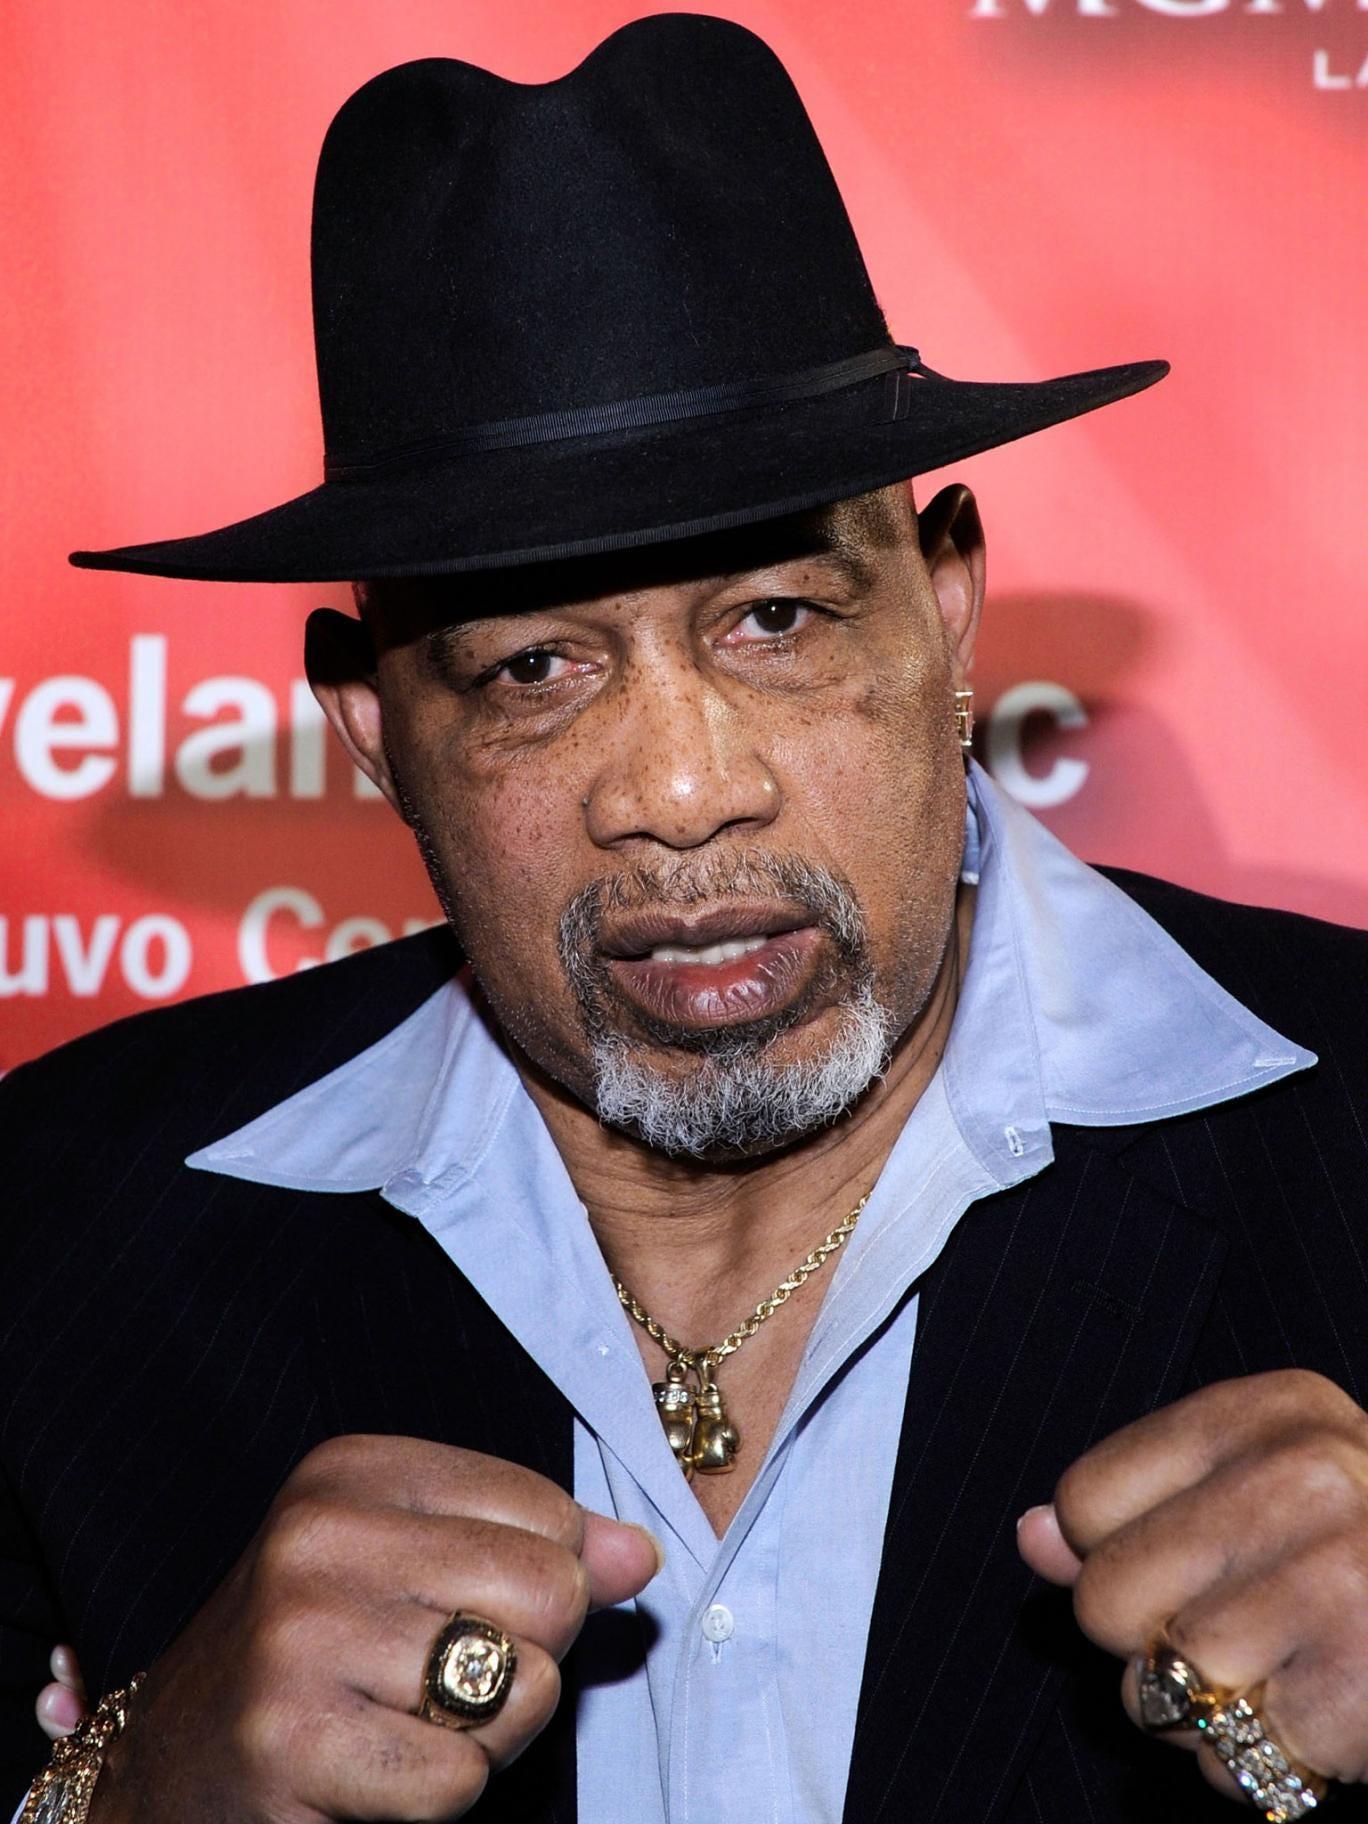 Bo boxer wladimir klitschko wikipedia the - Ken Norton Boxing Ken Norton Heavyweight Icon Who 39beat39 Muhammad